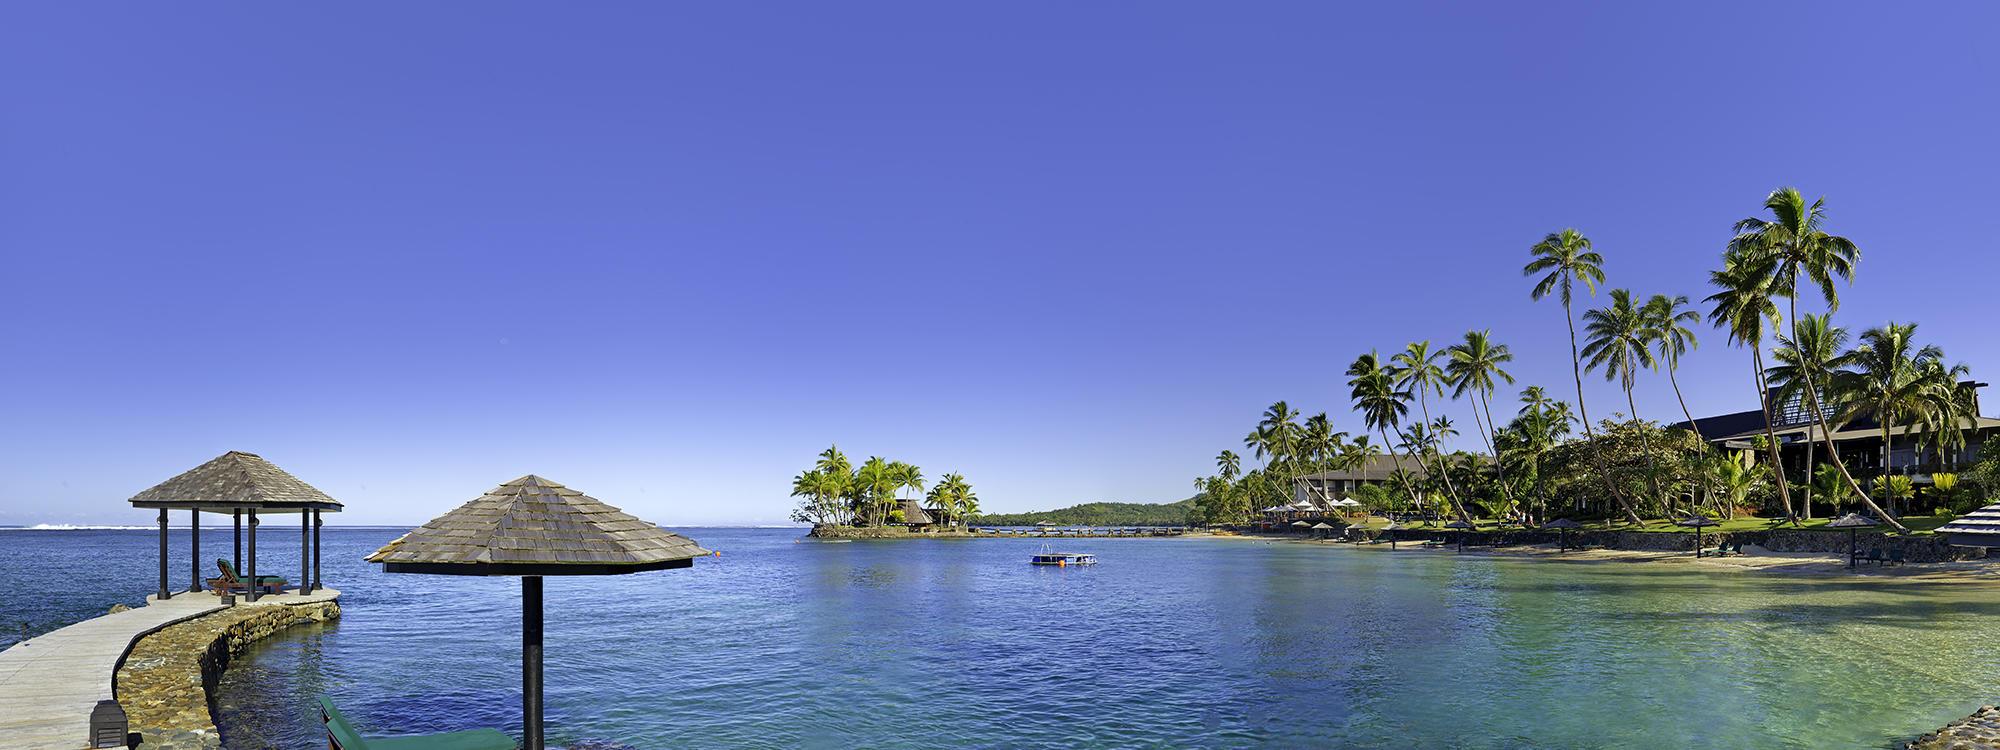 Fiji Holidays Offer Image